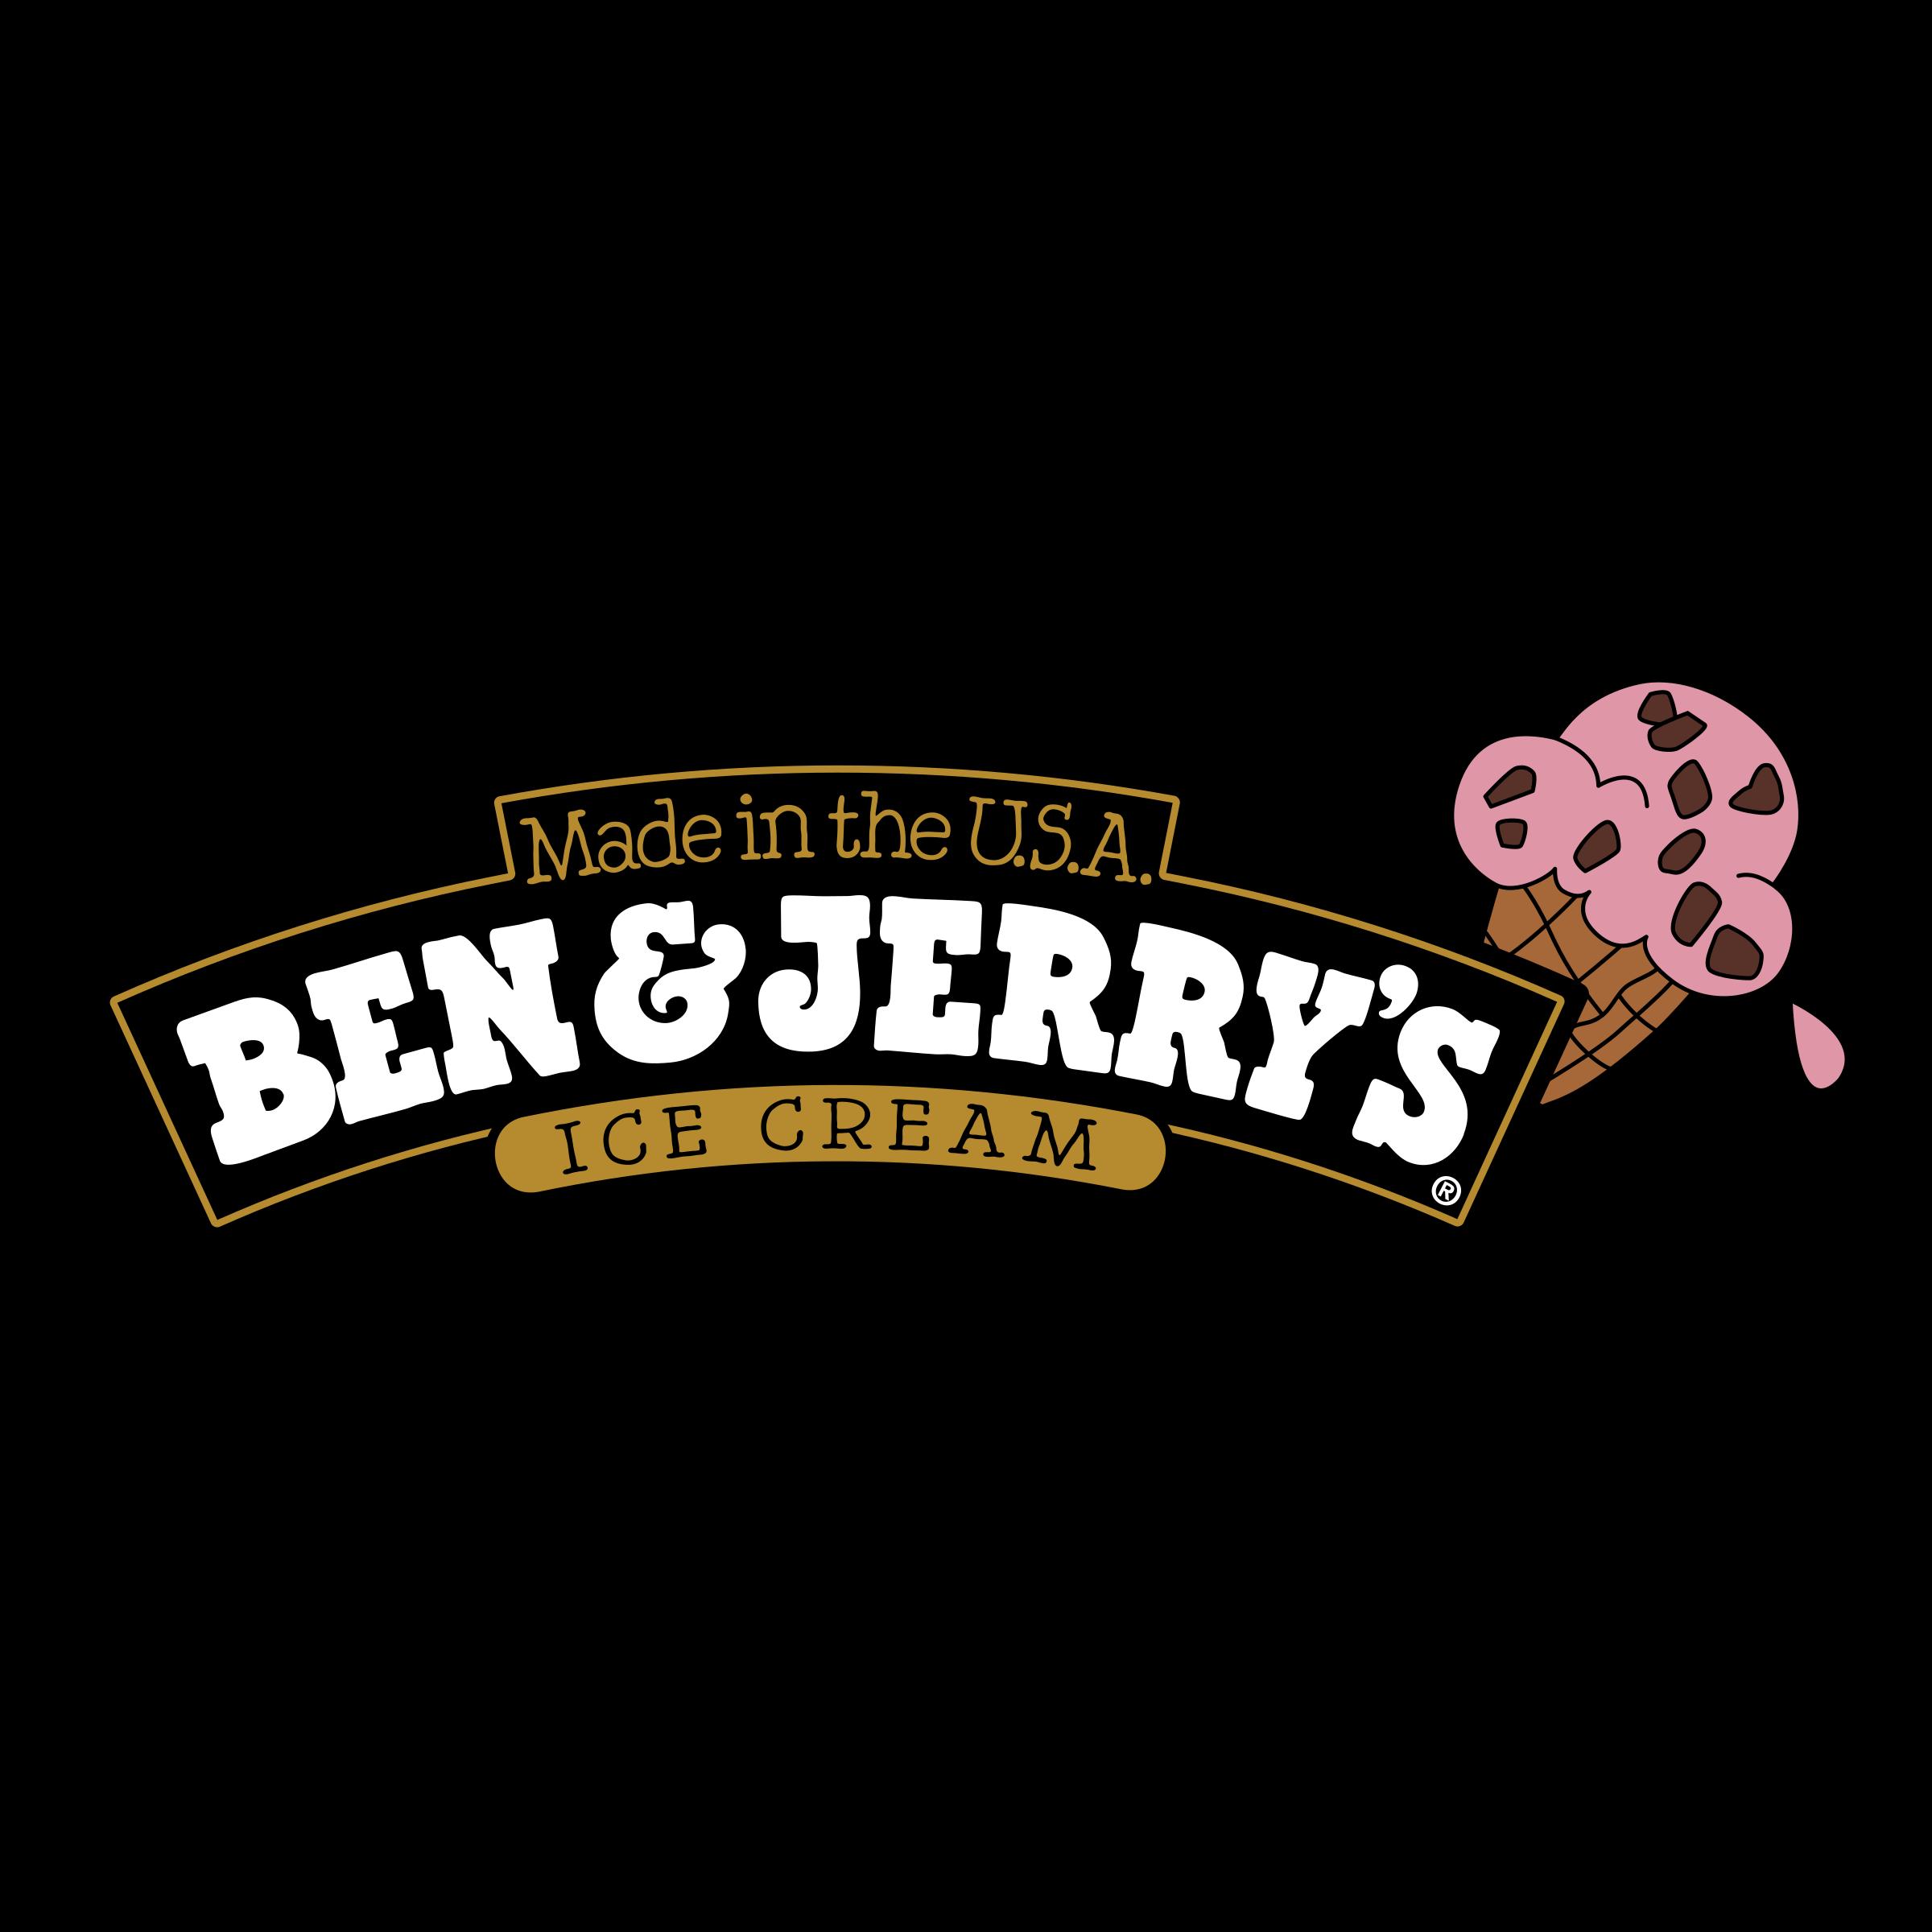 ben-jerrys-2-logo-png-transparent.png